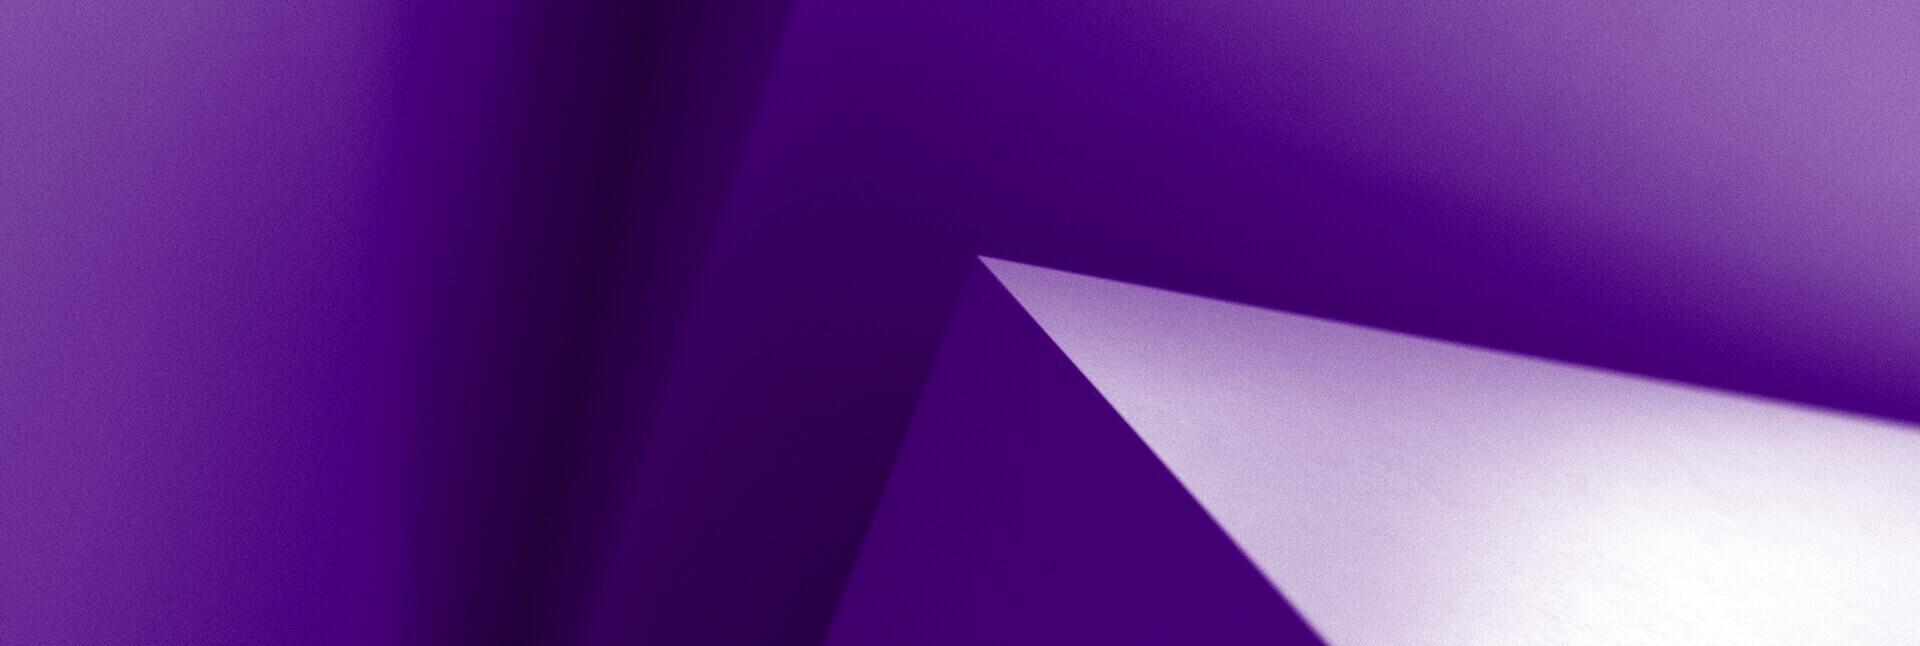 rra-background-purple-3-2018.jpg